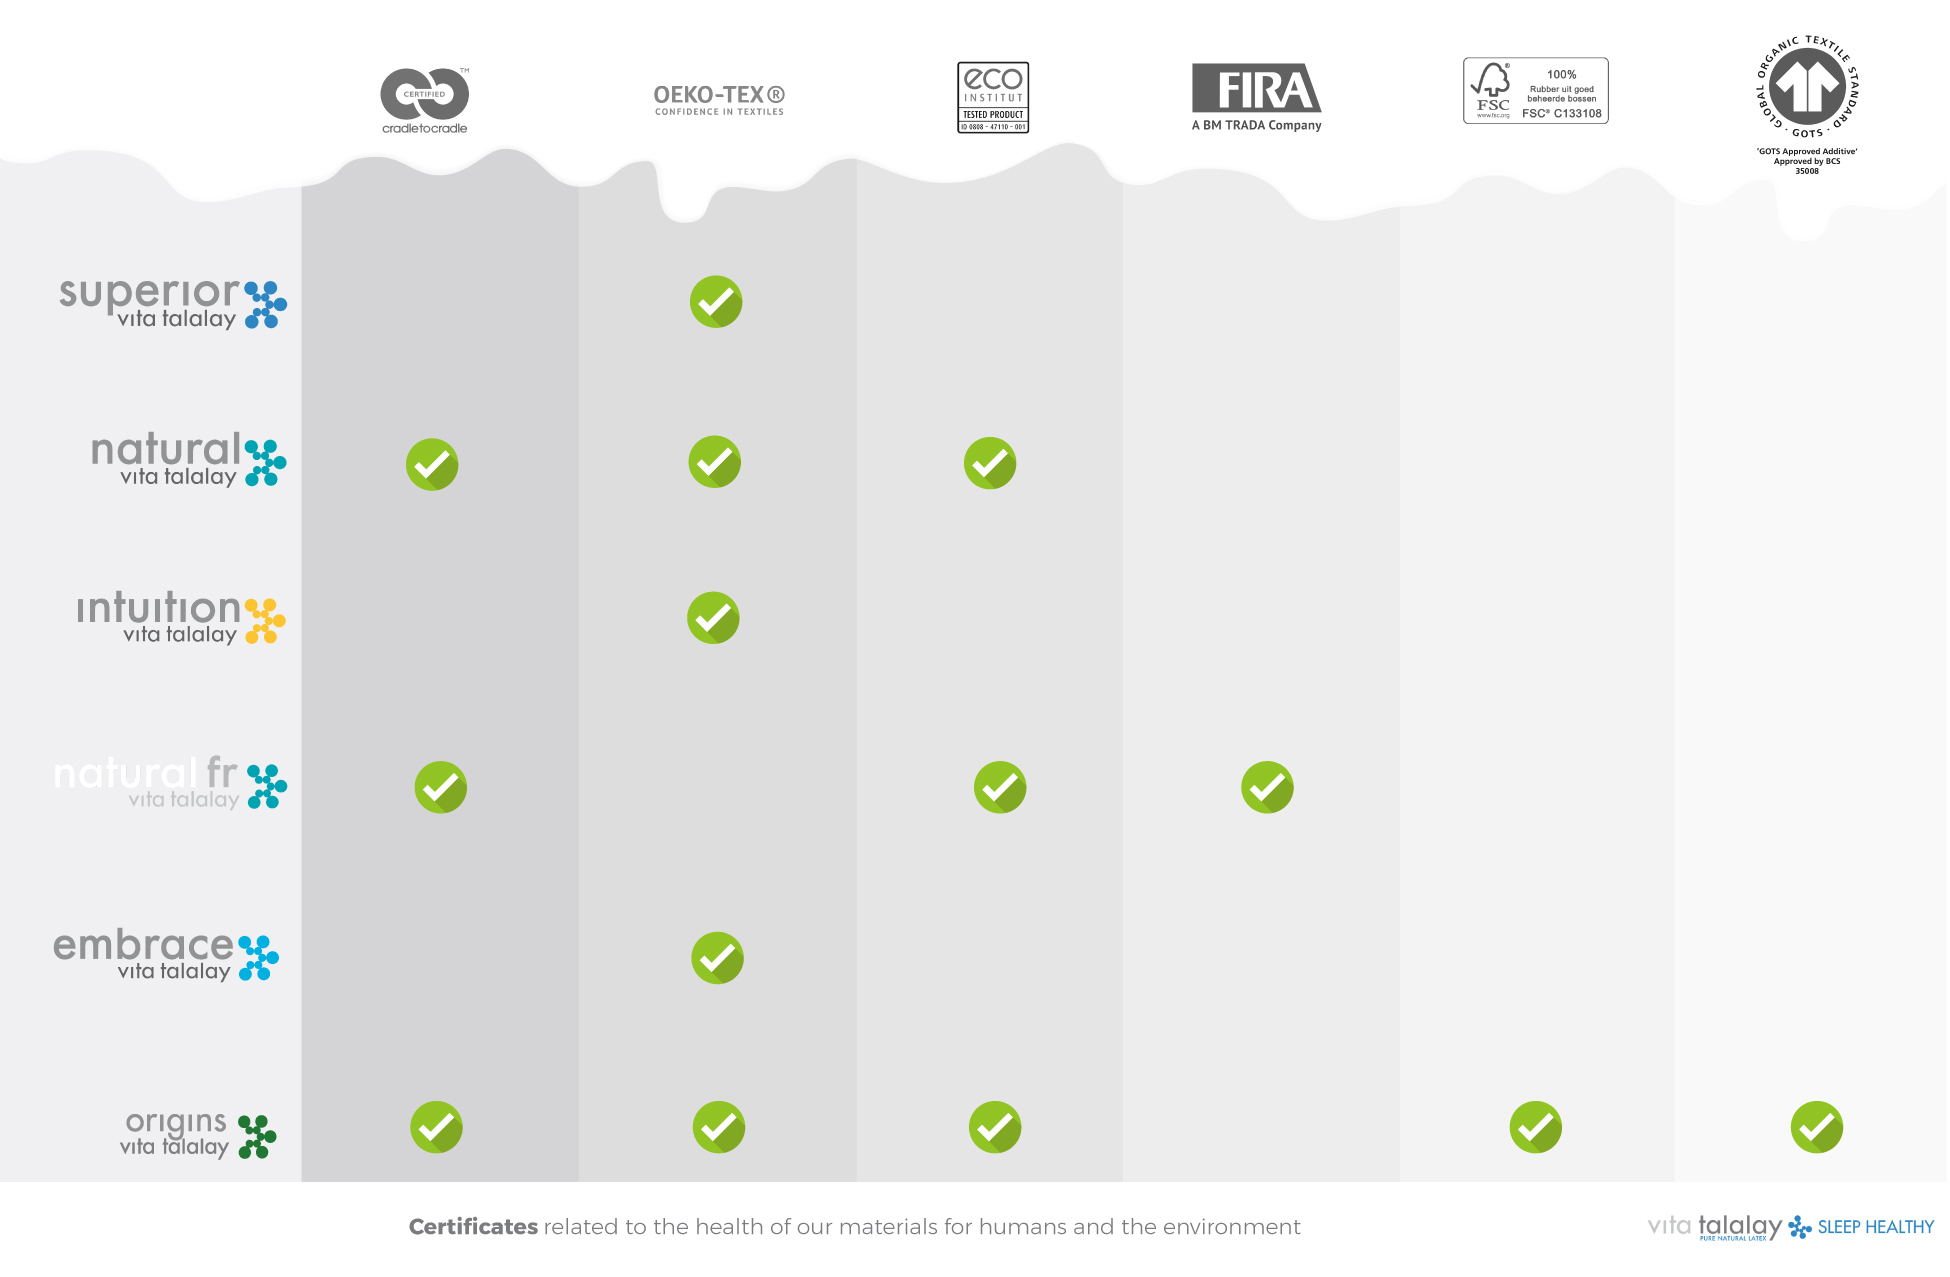 vita-talalay-latex-mattress-products-certifications.jpg#asset:10262